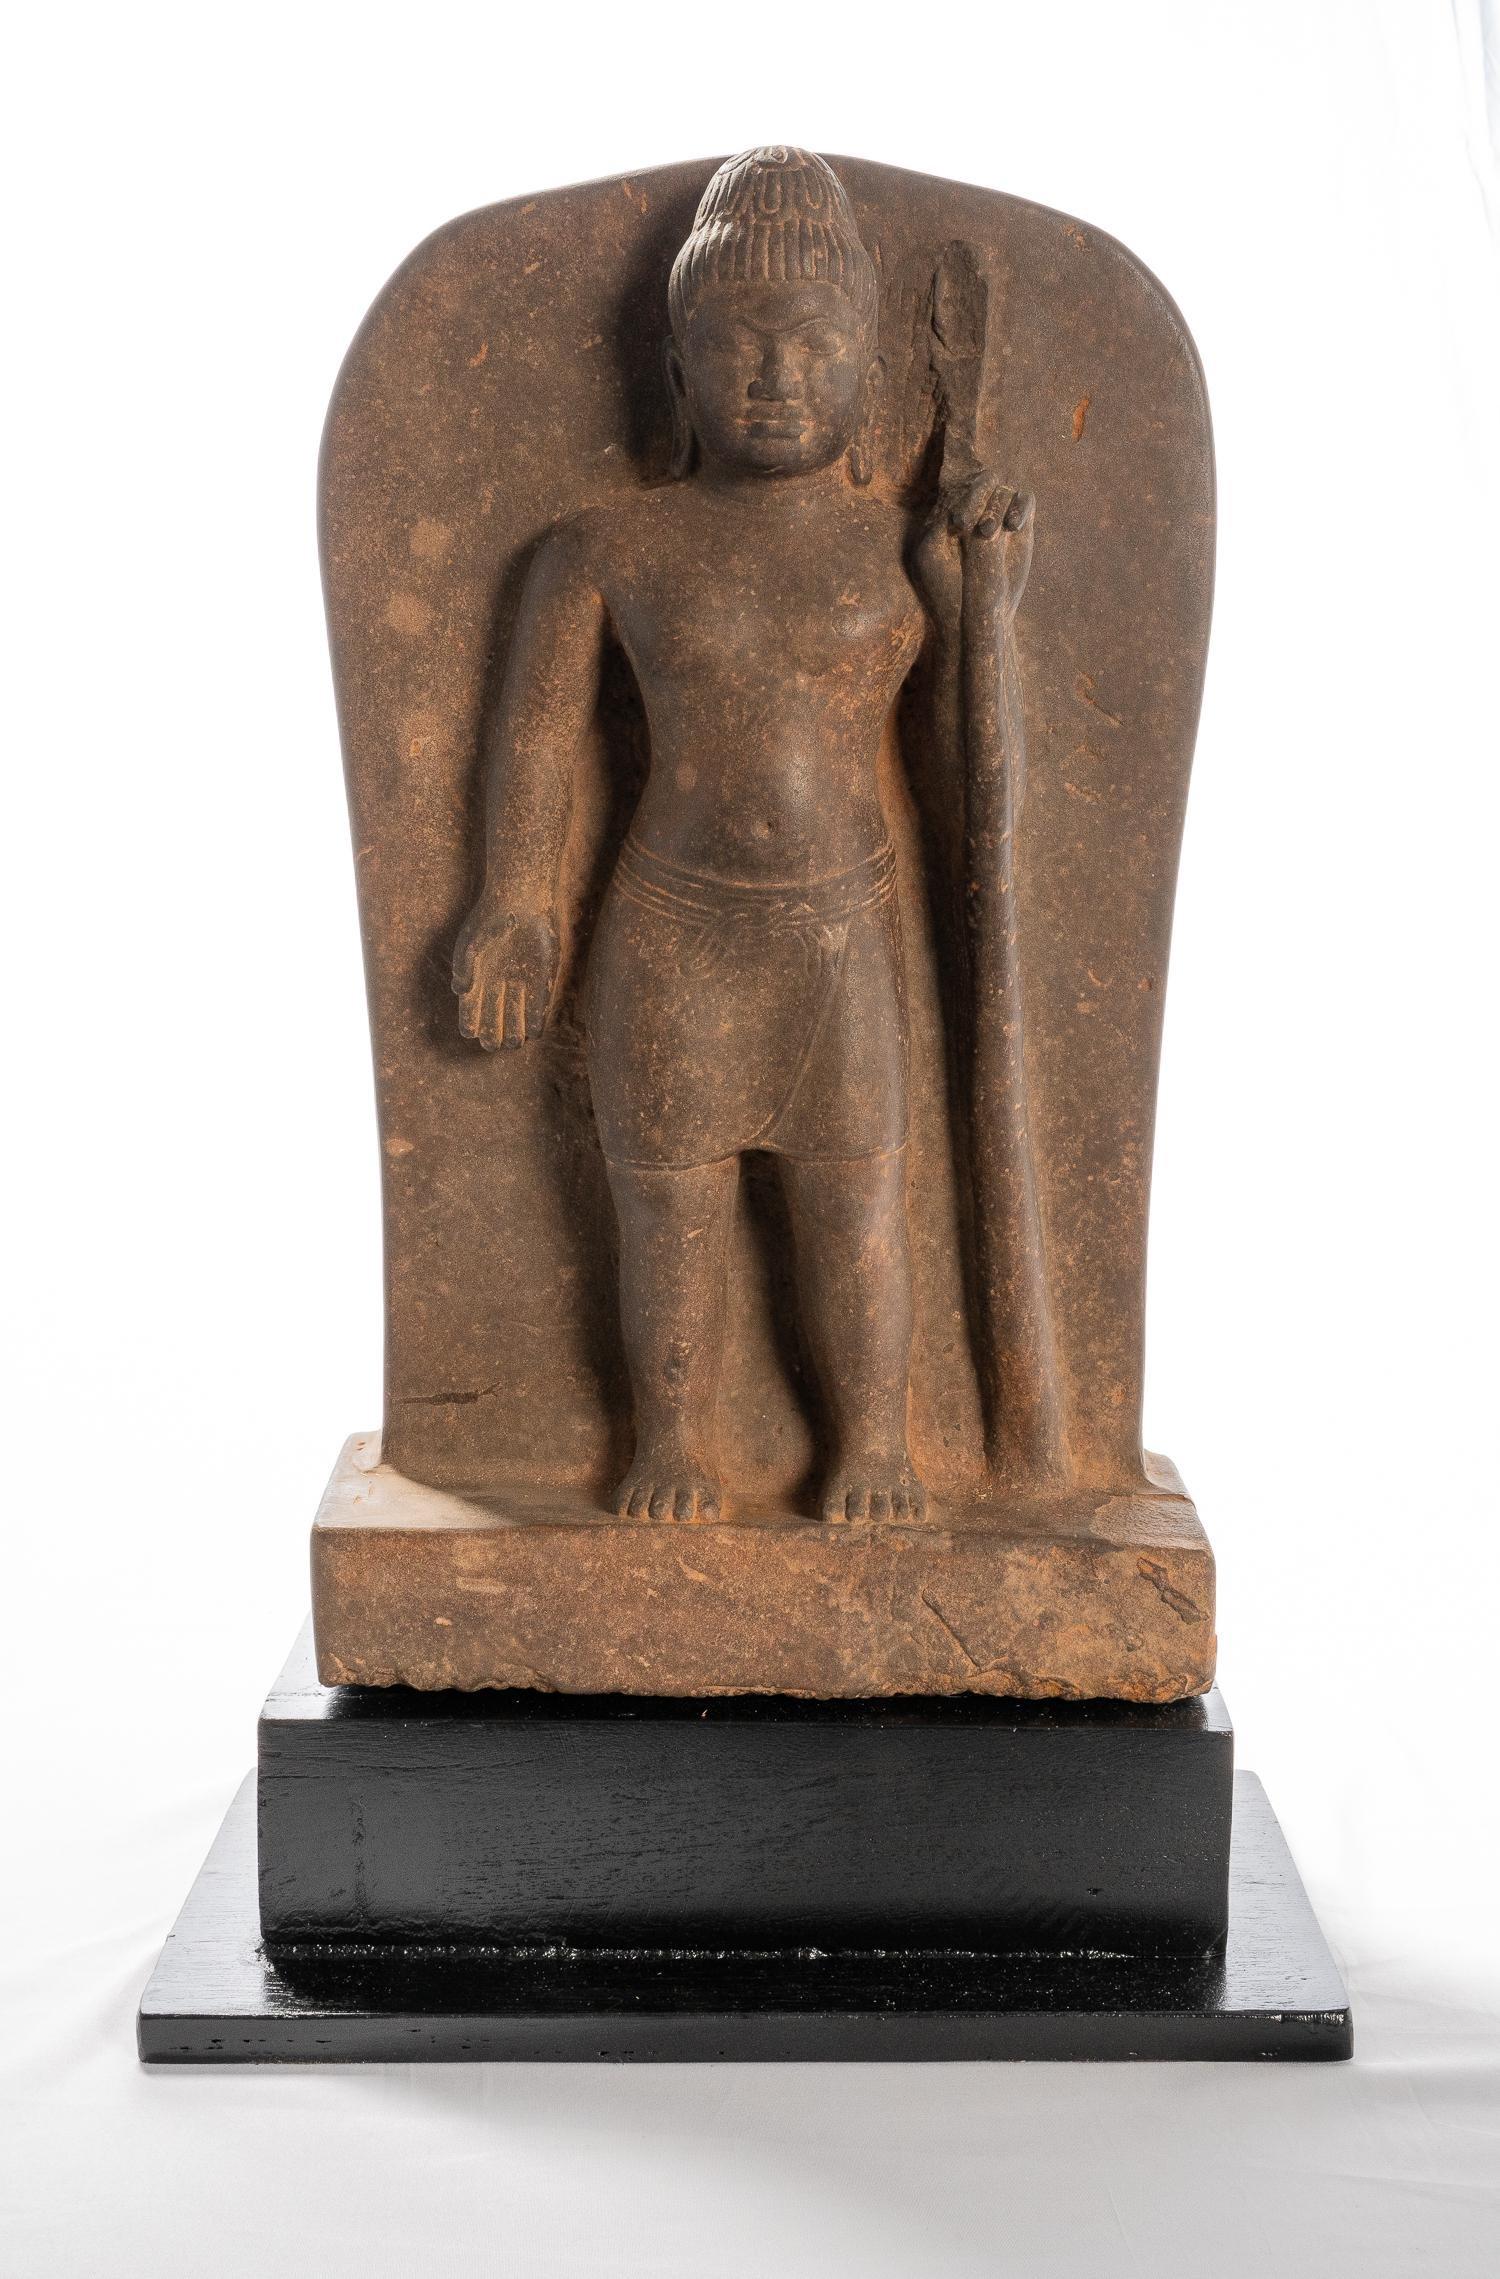 Antique Khmer Style Phnom Da Stone Stele - Vishnu